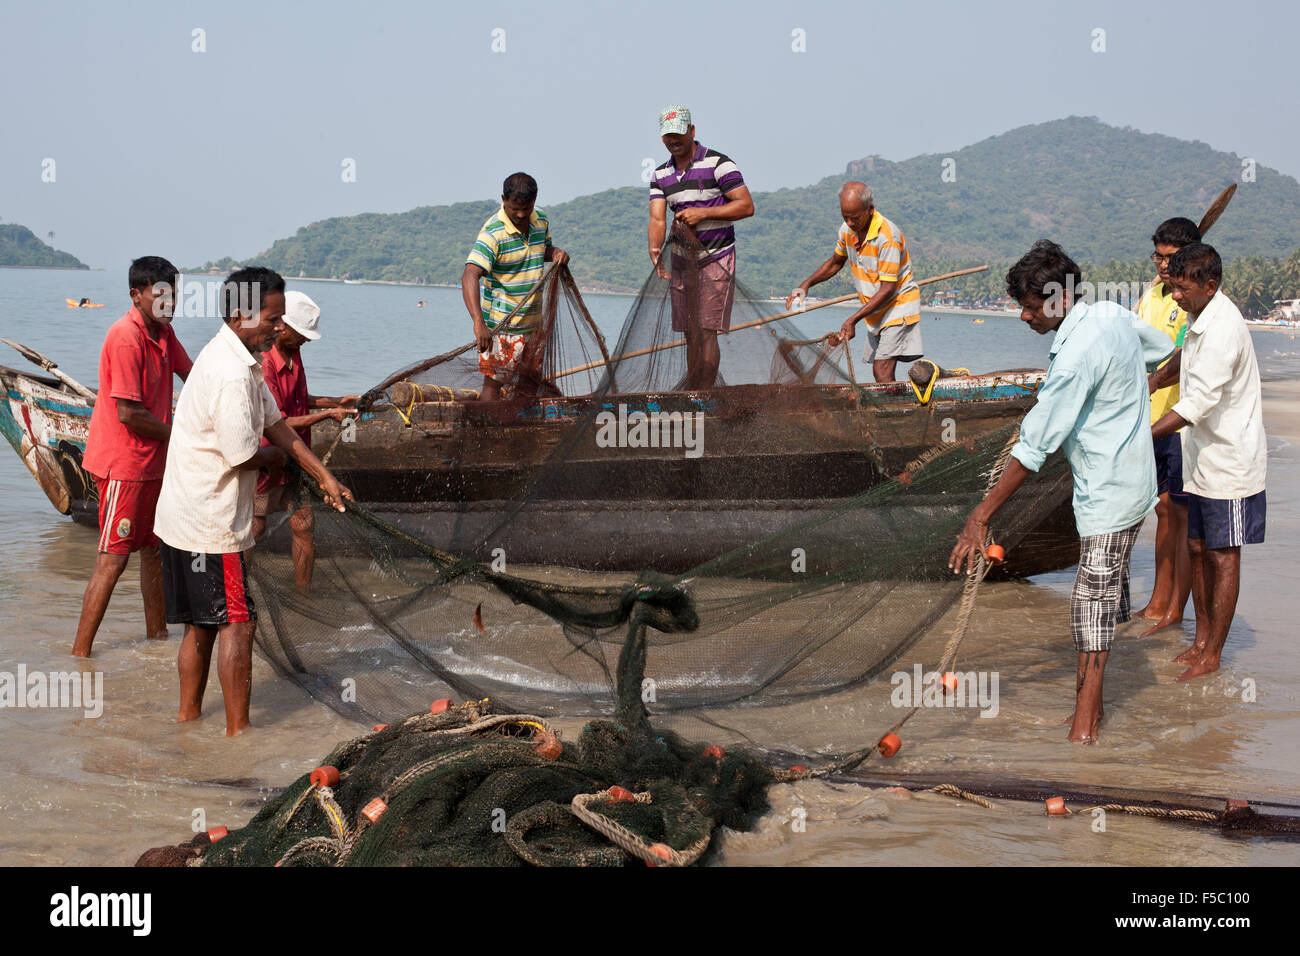 Vizhinjam Christian fisherman village in Kerala, India, November 2014. Fishing with the nets. - Stock Image